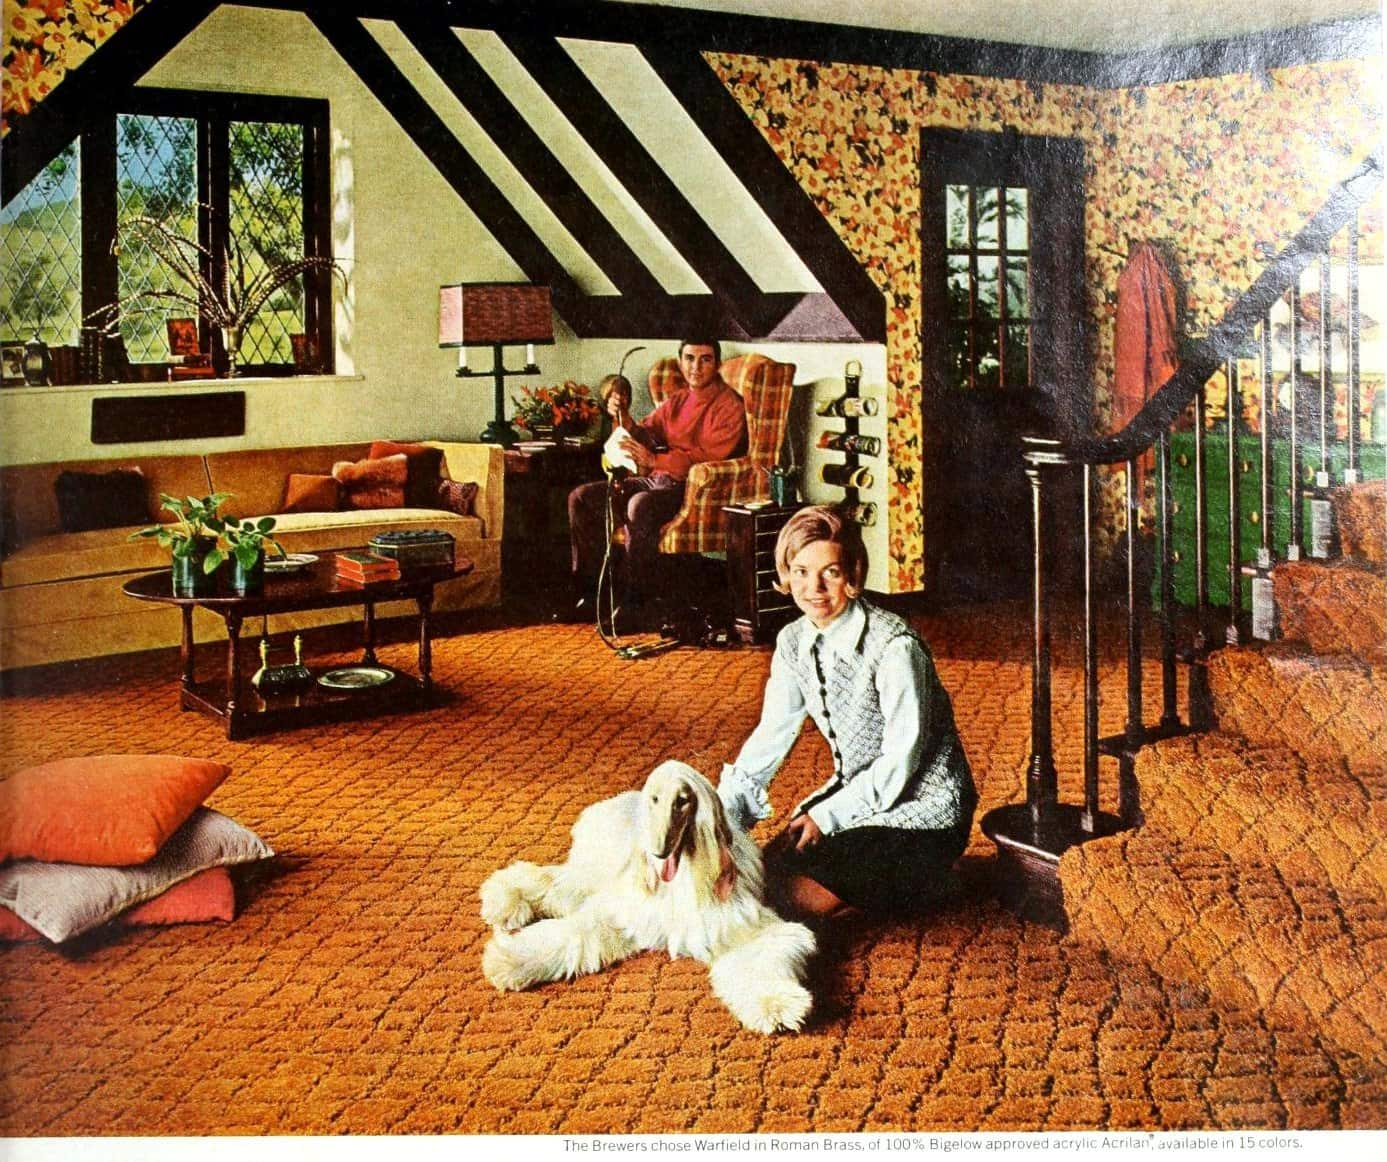 Vintage Roman Brass color - orange textured sculptured carpet (1969)